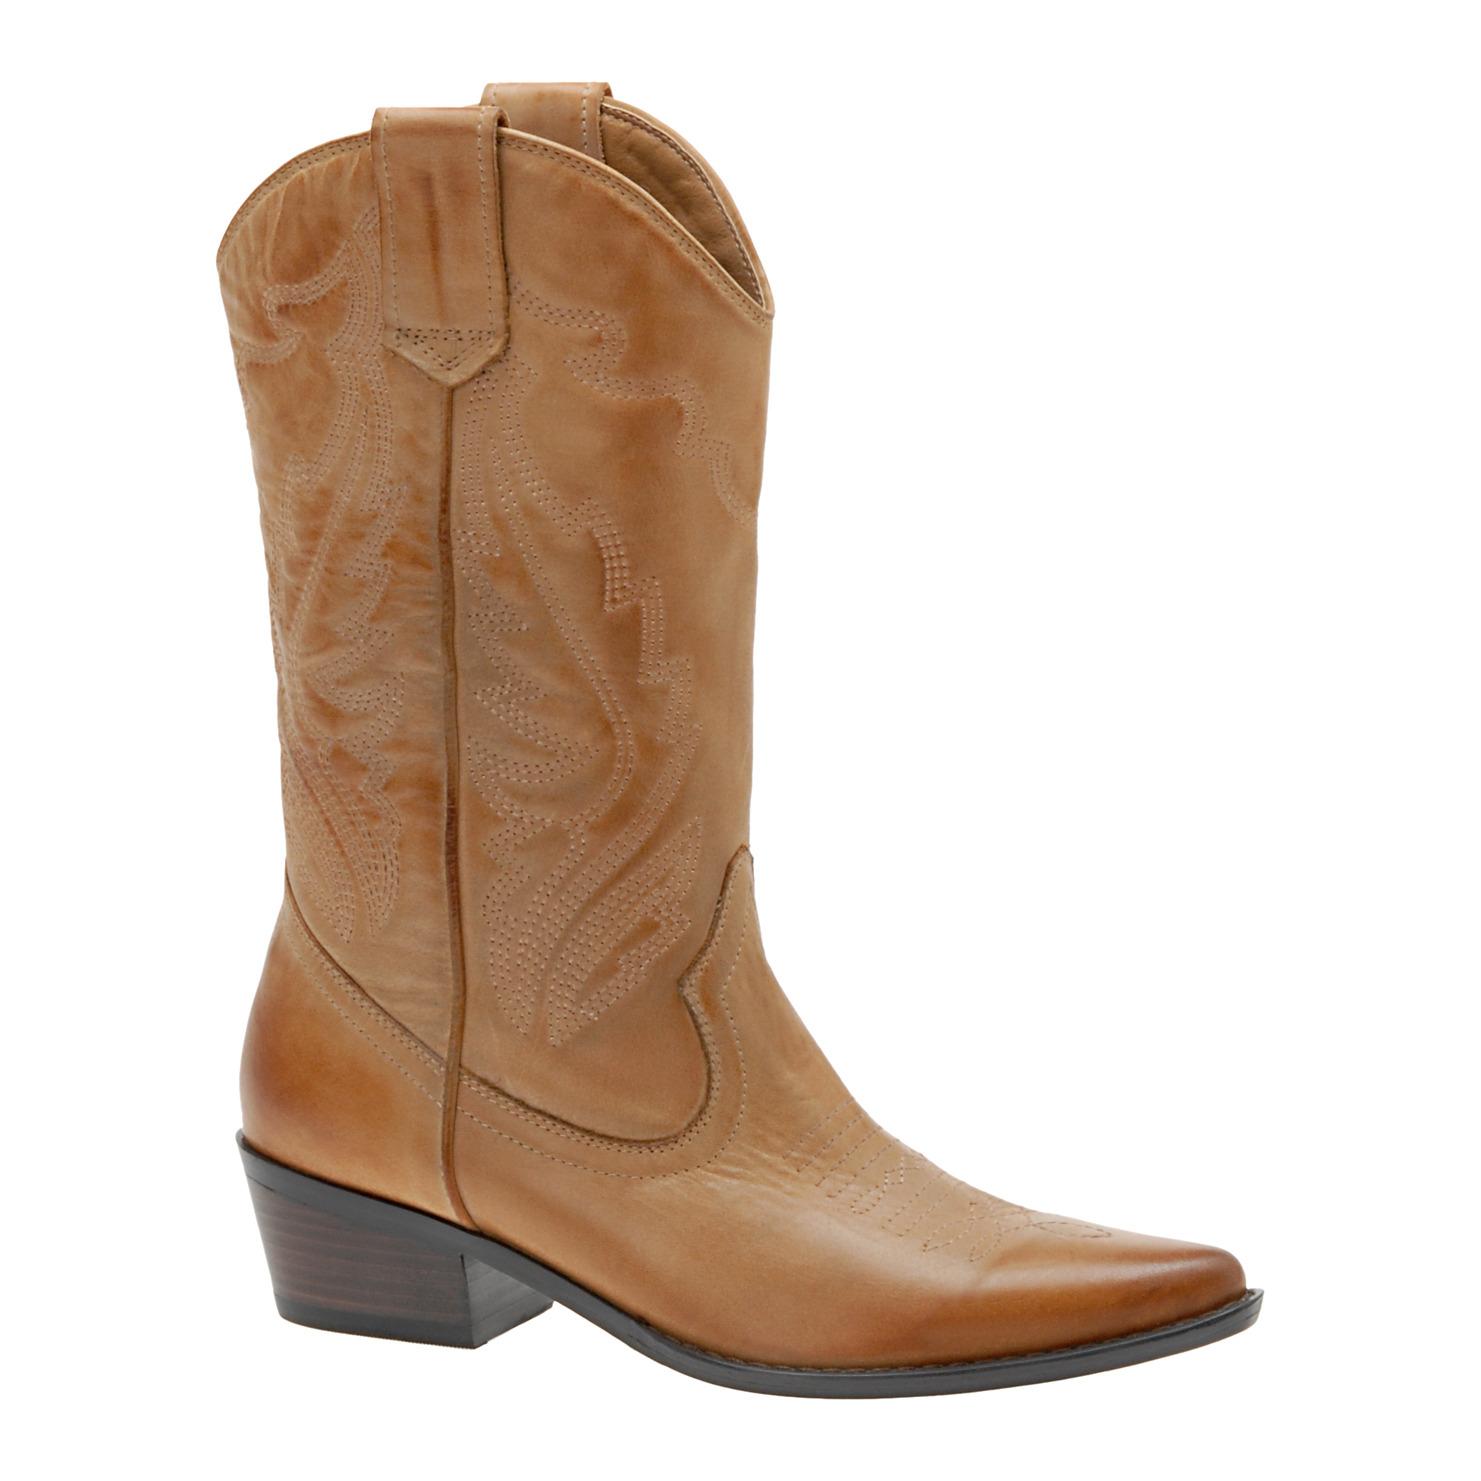 1481x1481 Cowboy Boot Boot Silhouette Clip Art